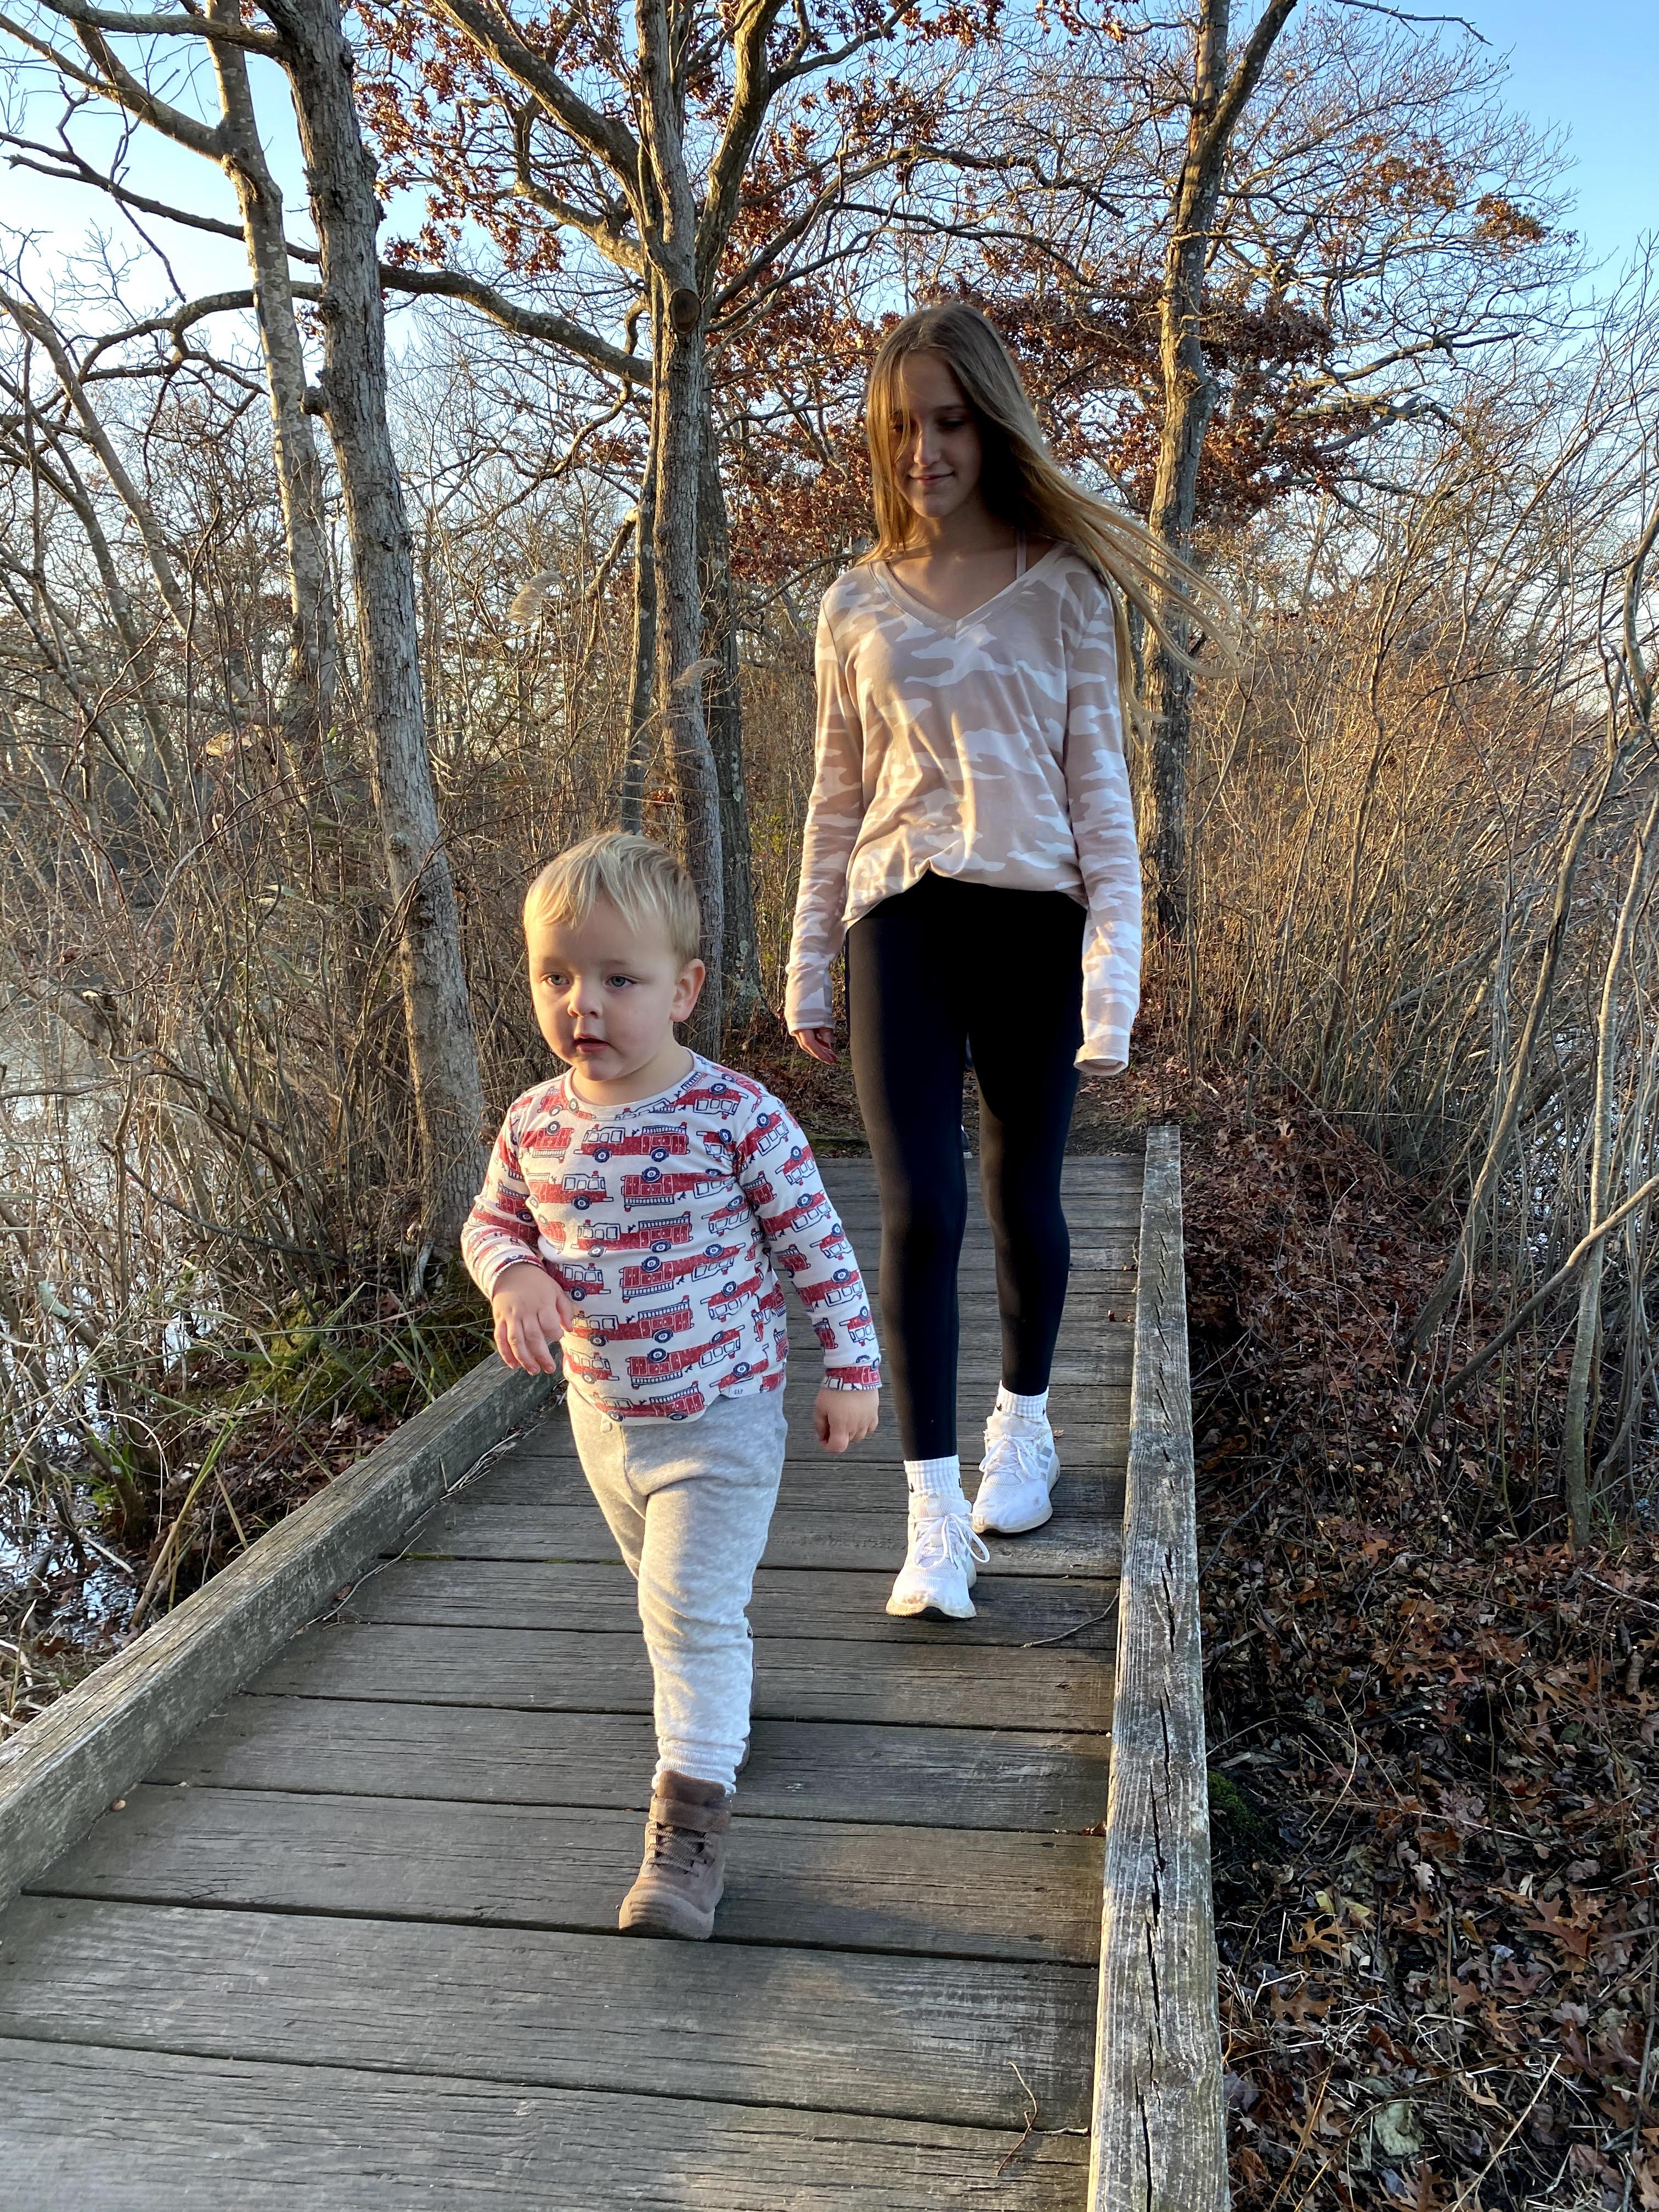 Avery & Ben explore Ryan Park